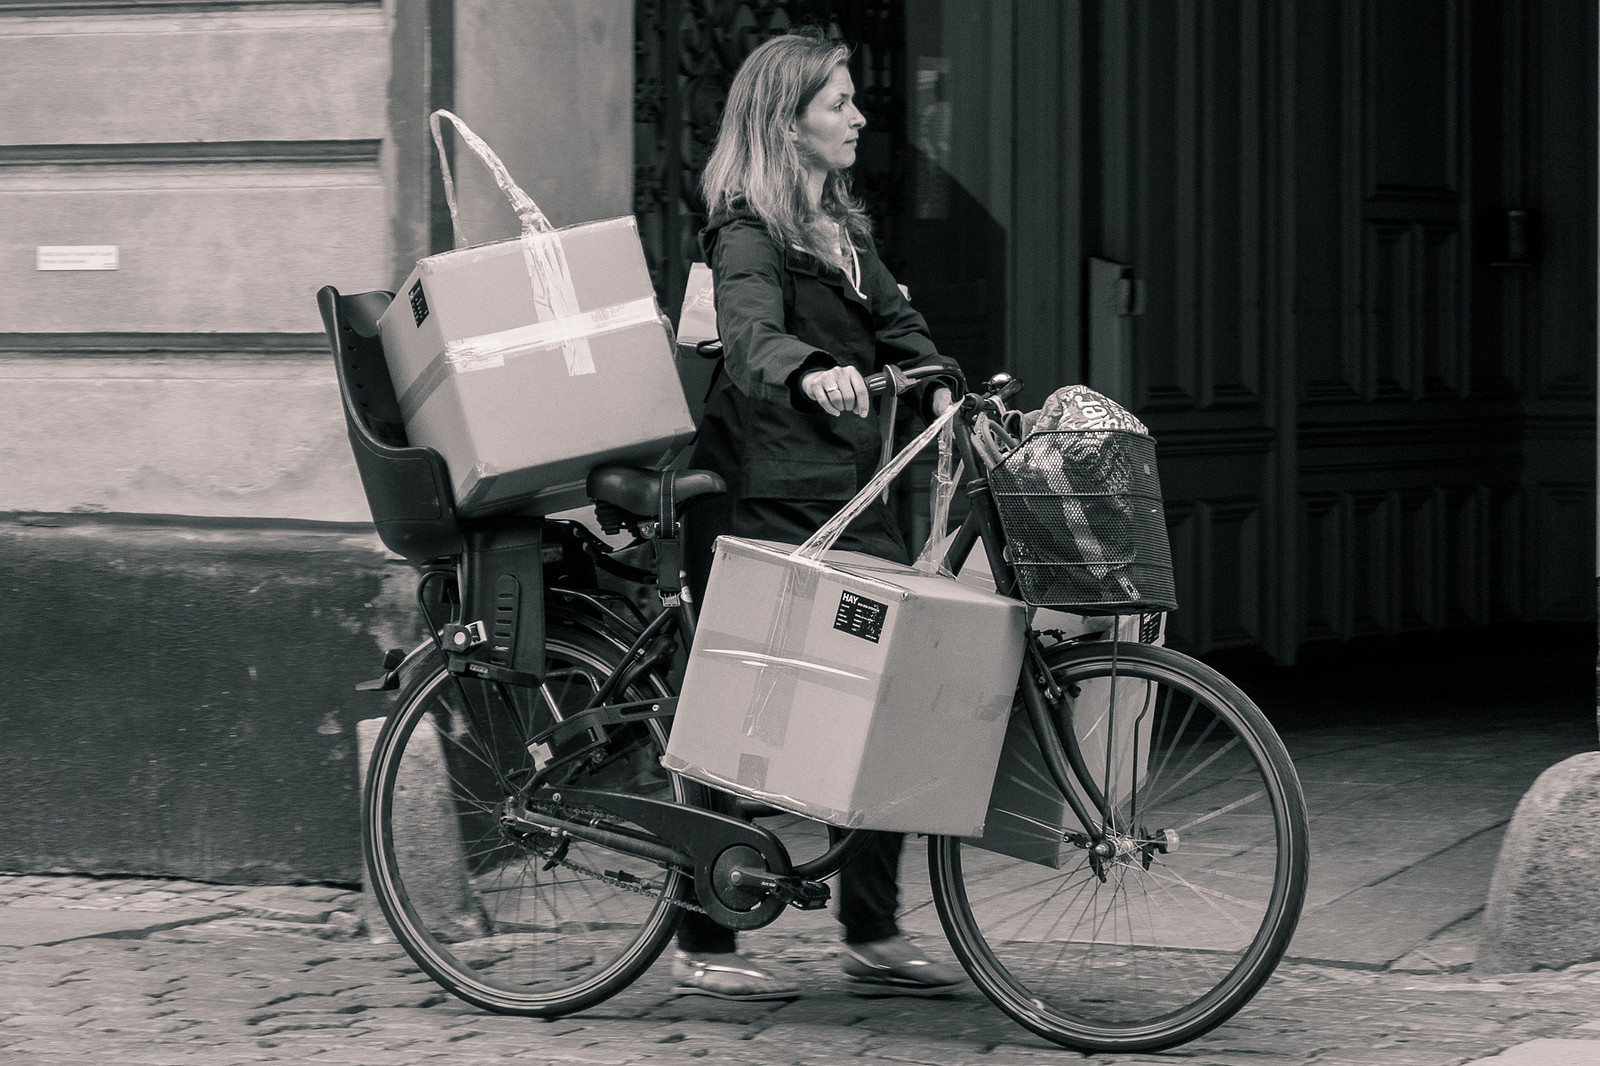 Amanda Graham - Three boxes on a bike 0205 - 9425418817_6e439d67f9_h.jpg